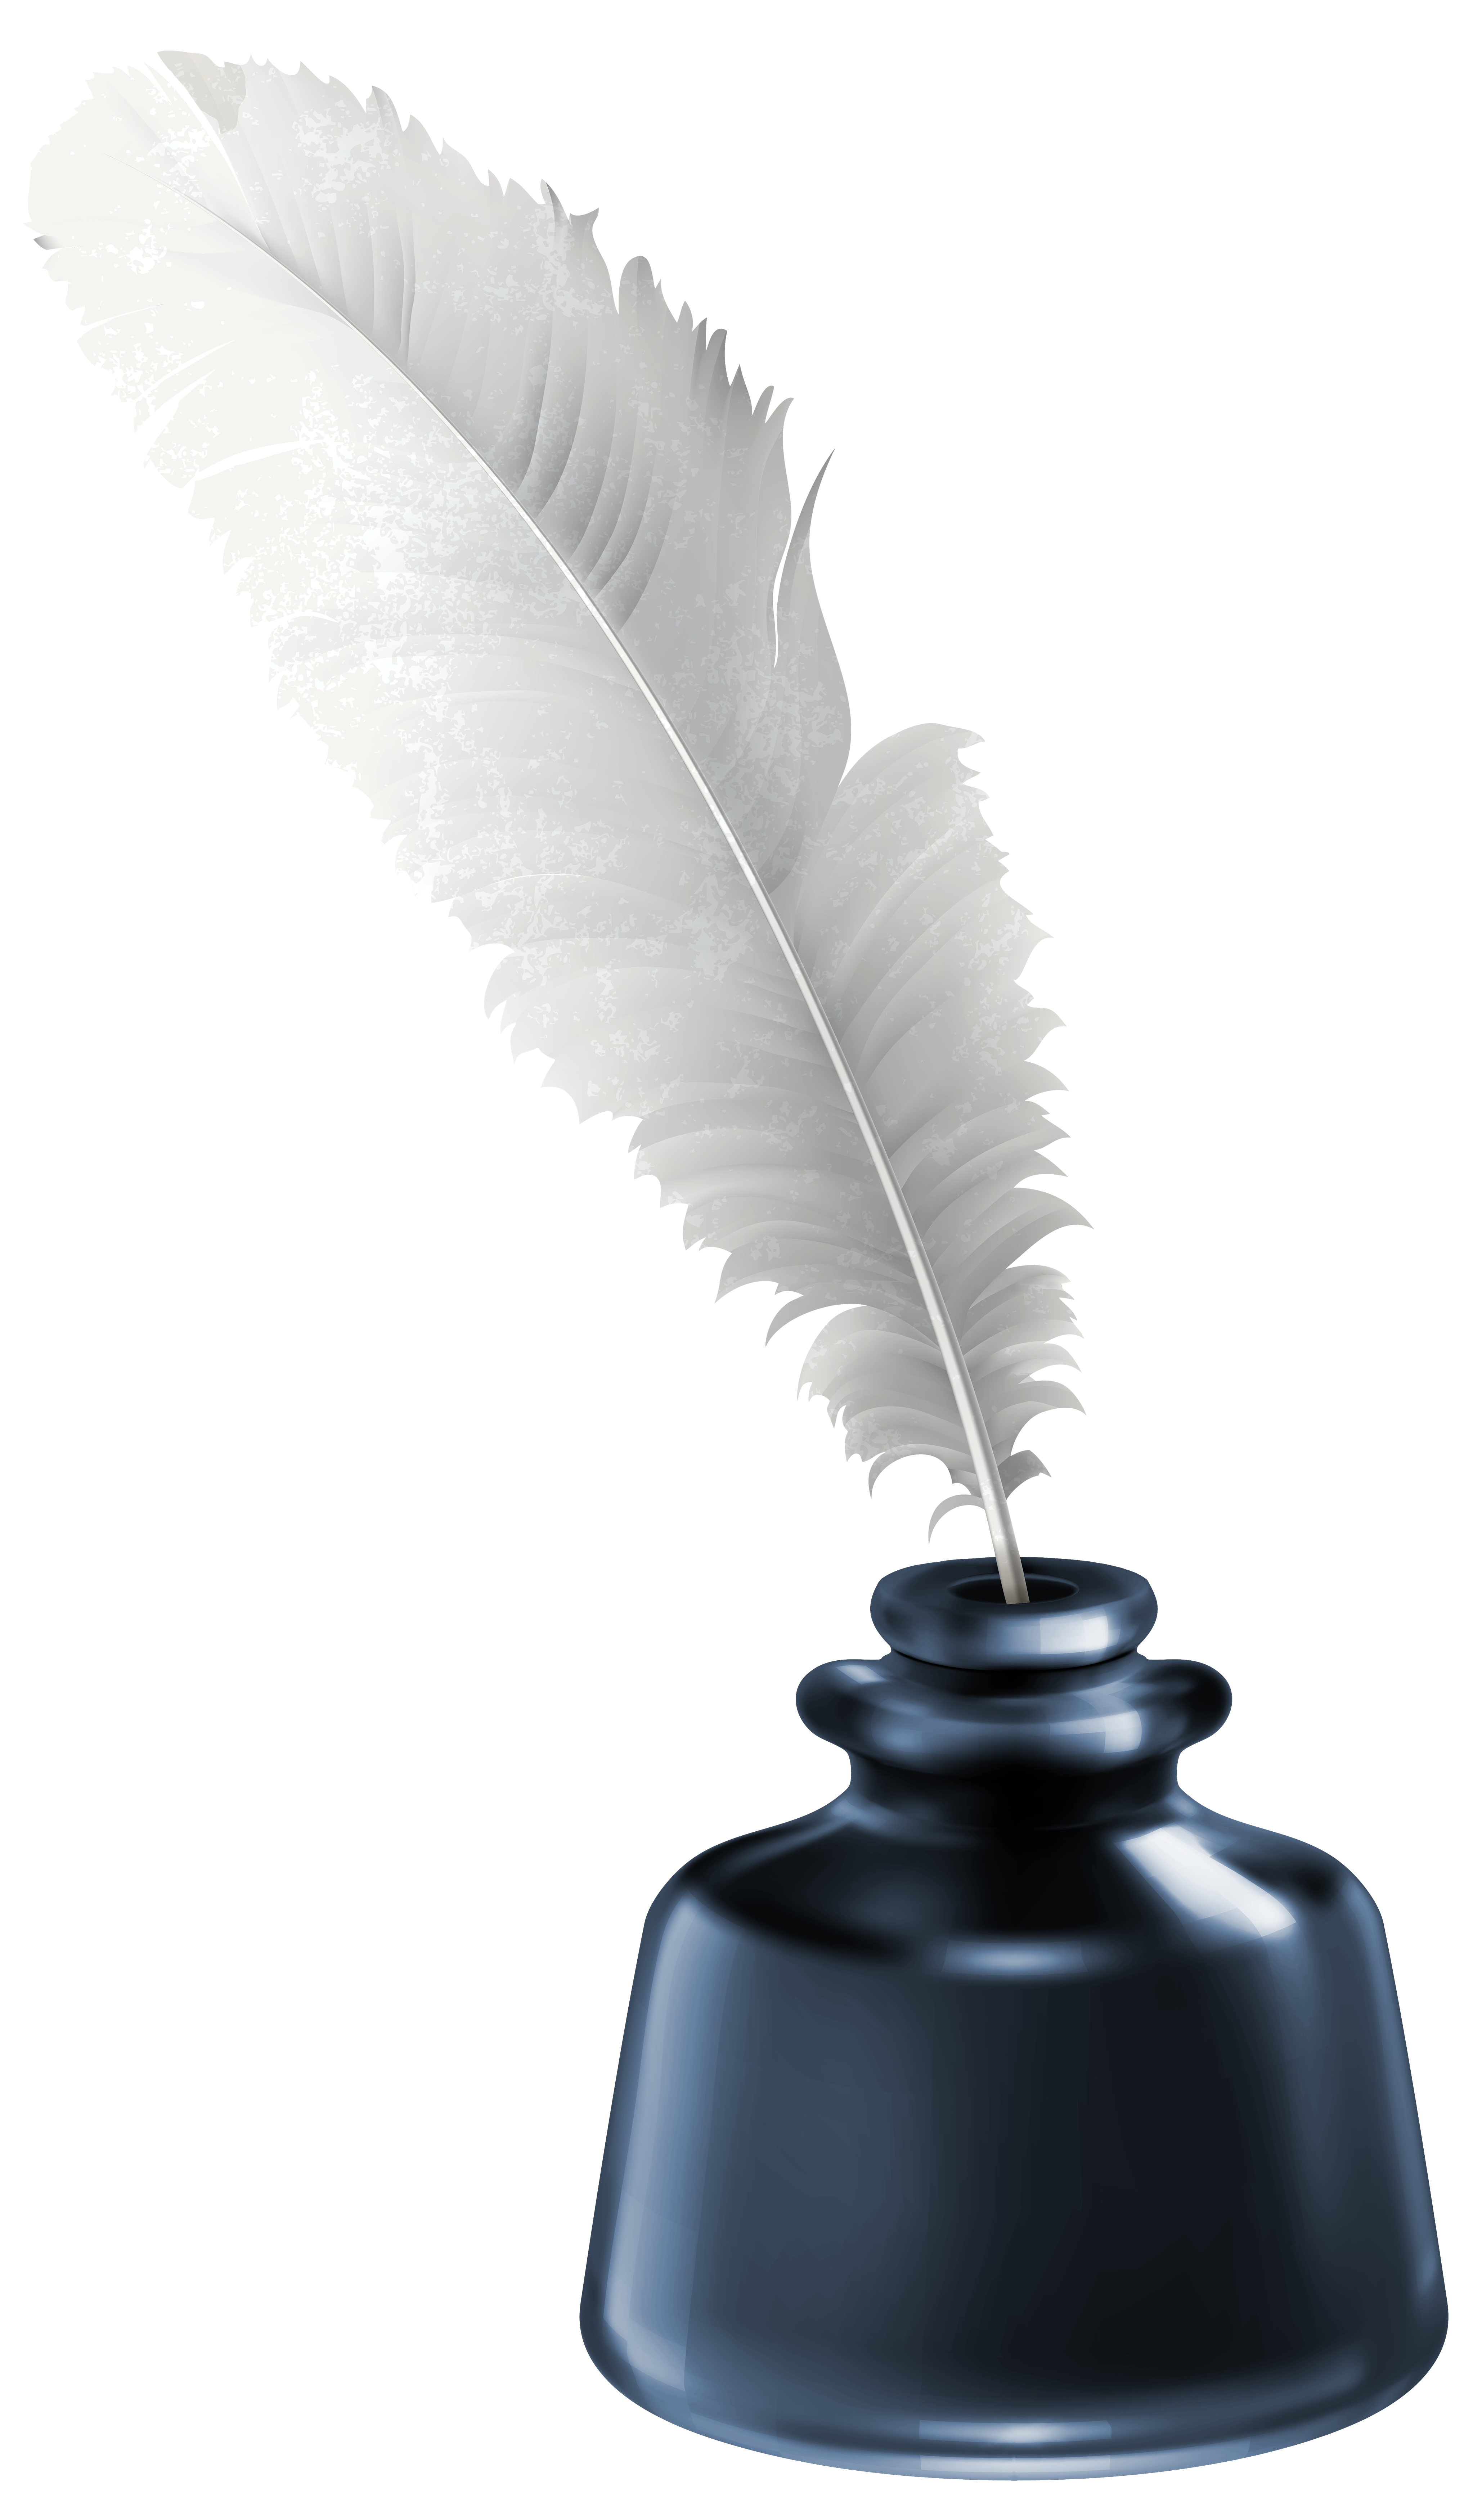 4116x7000 Quill And Blue Ink Pot Transparent Png Clip Art Imageu200b Gallery